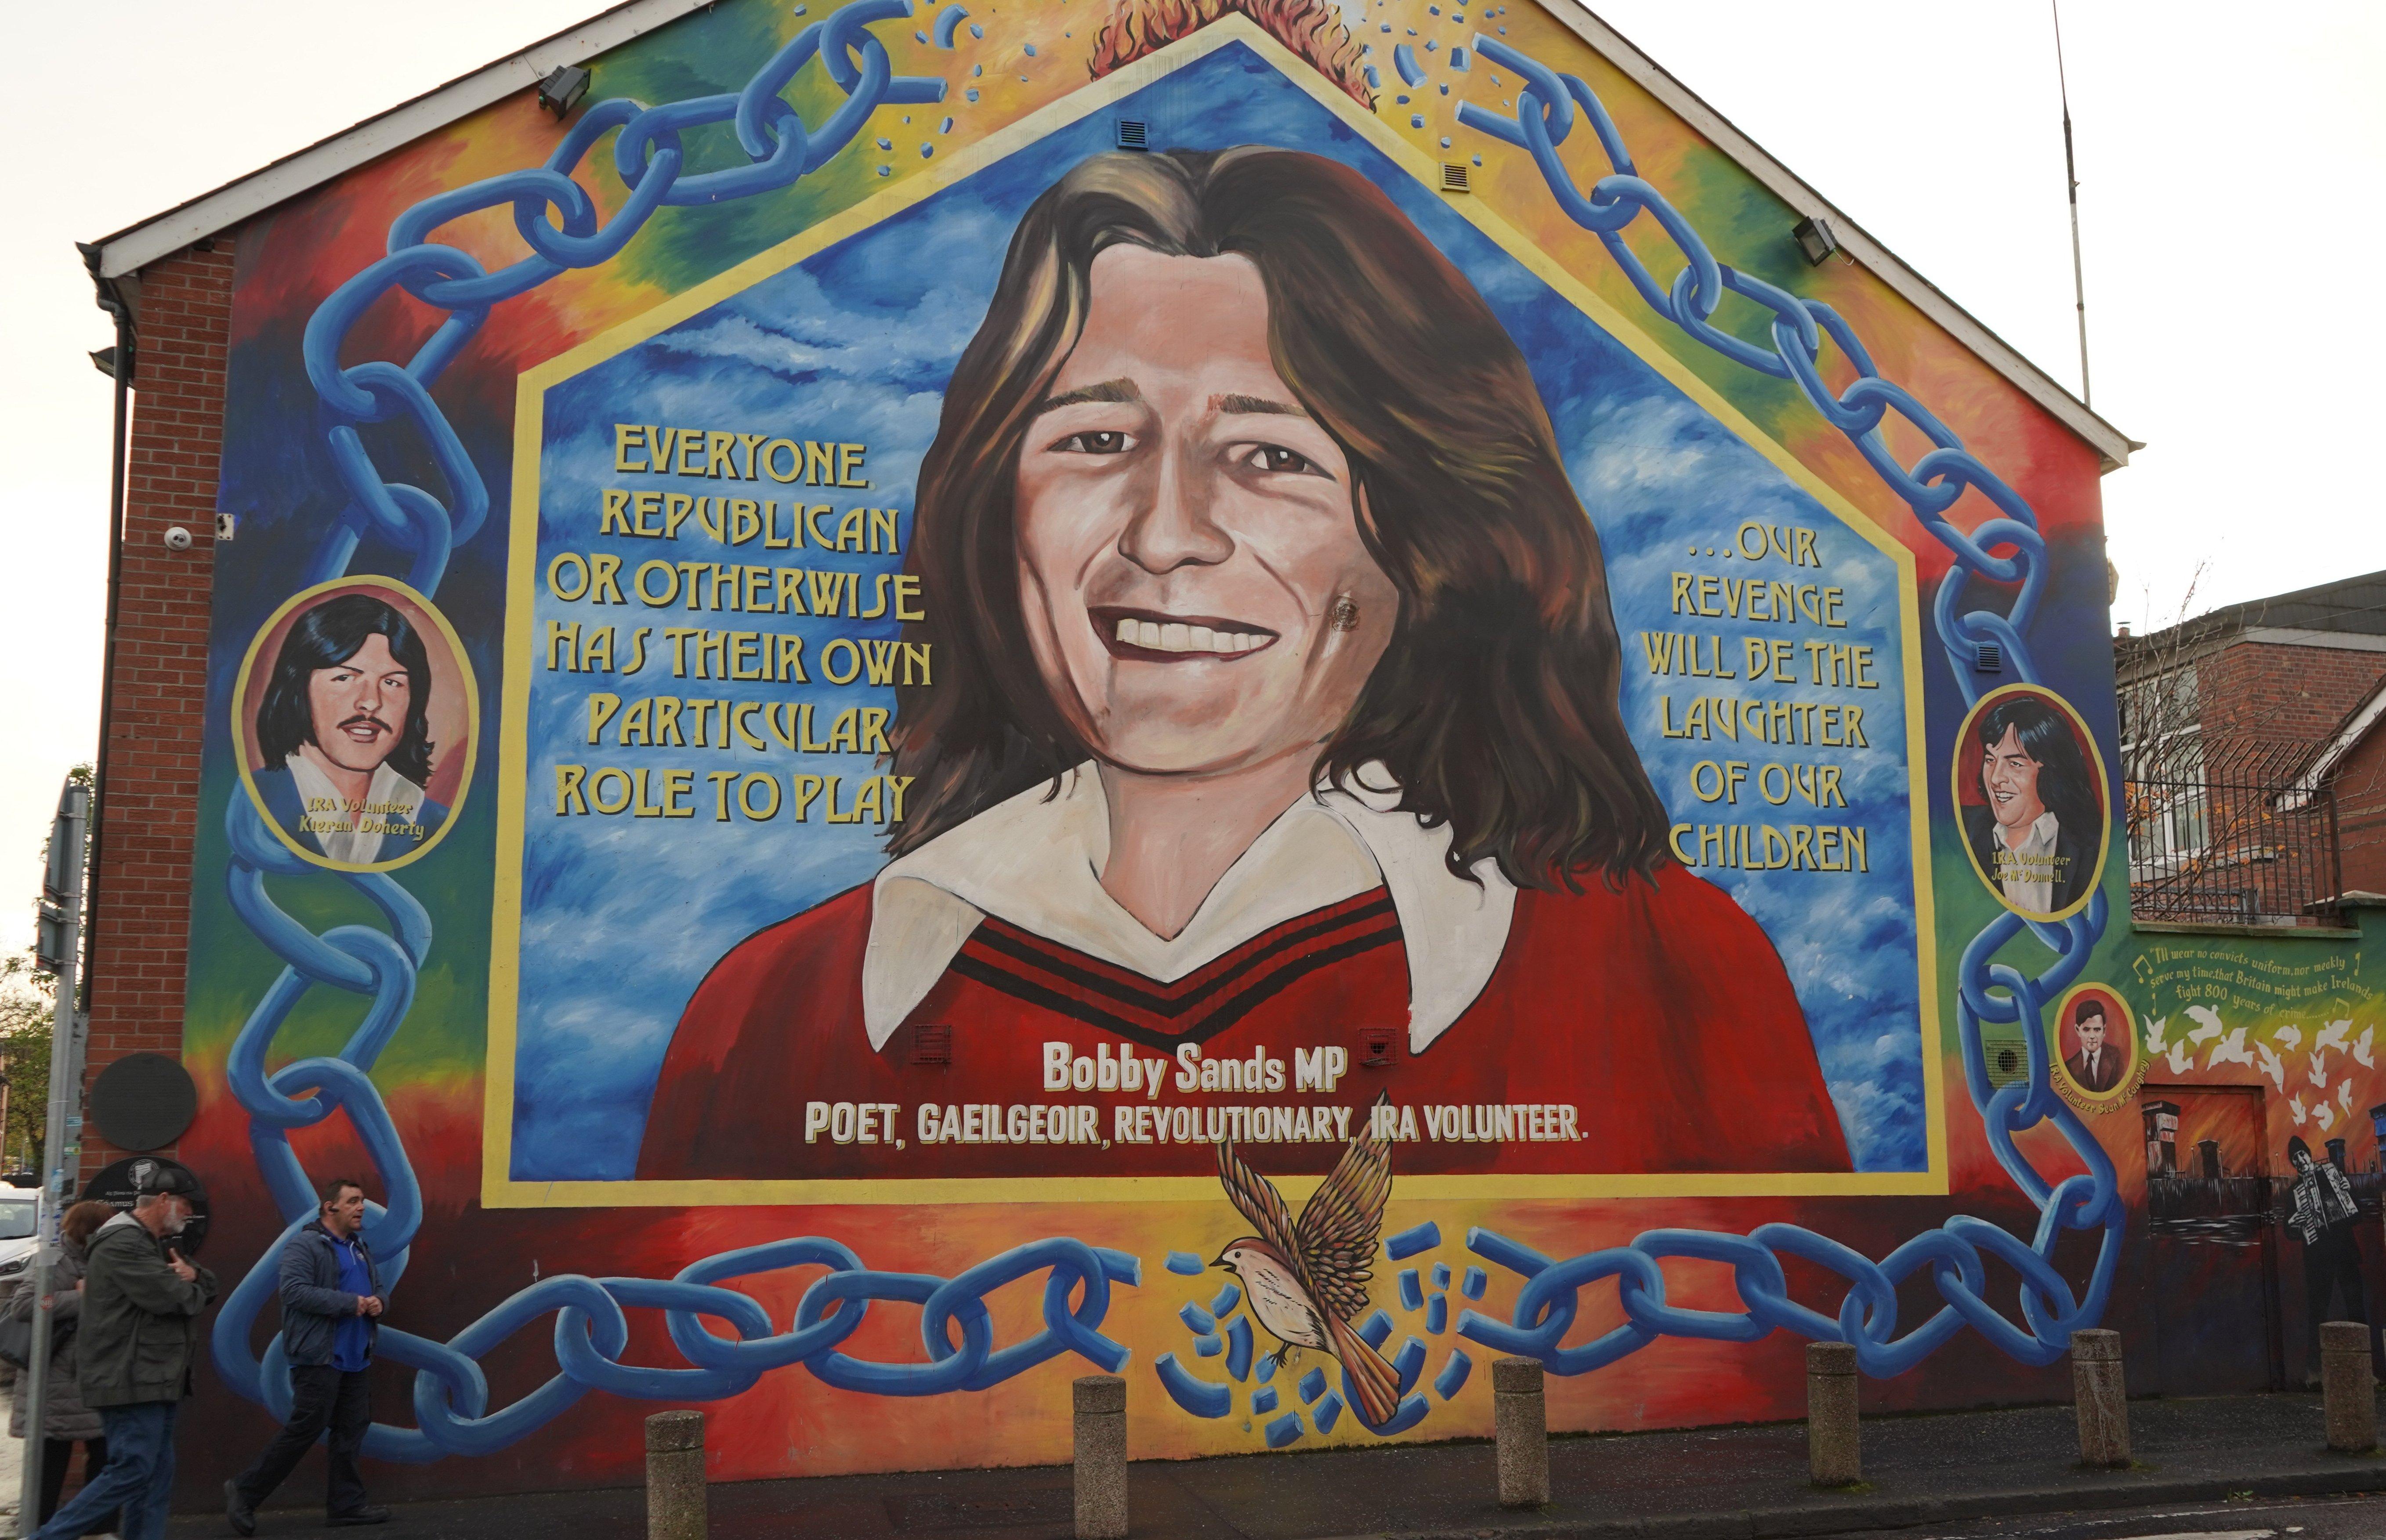 The Bobby Sands Mural